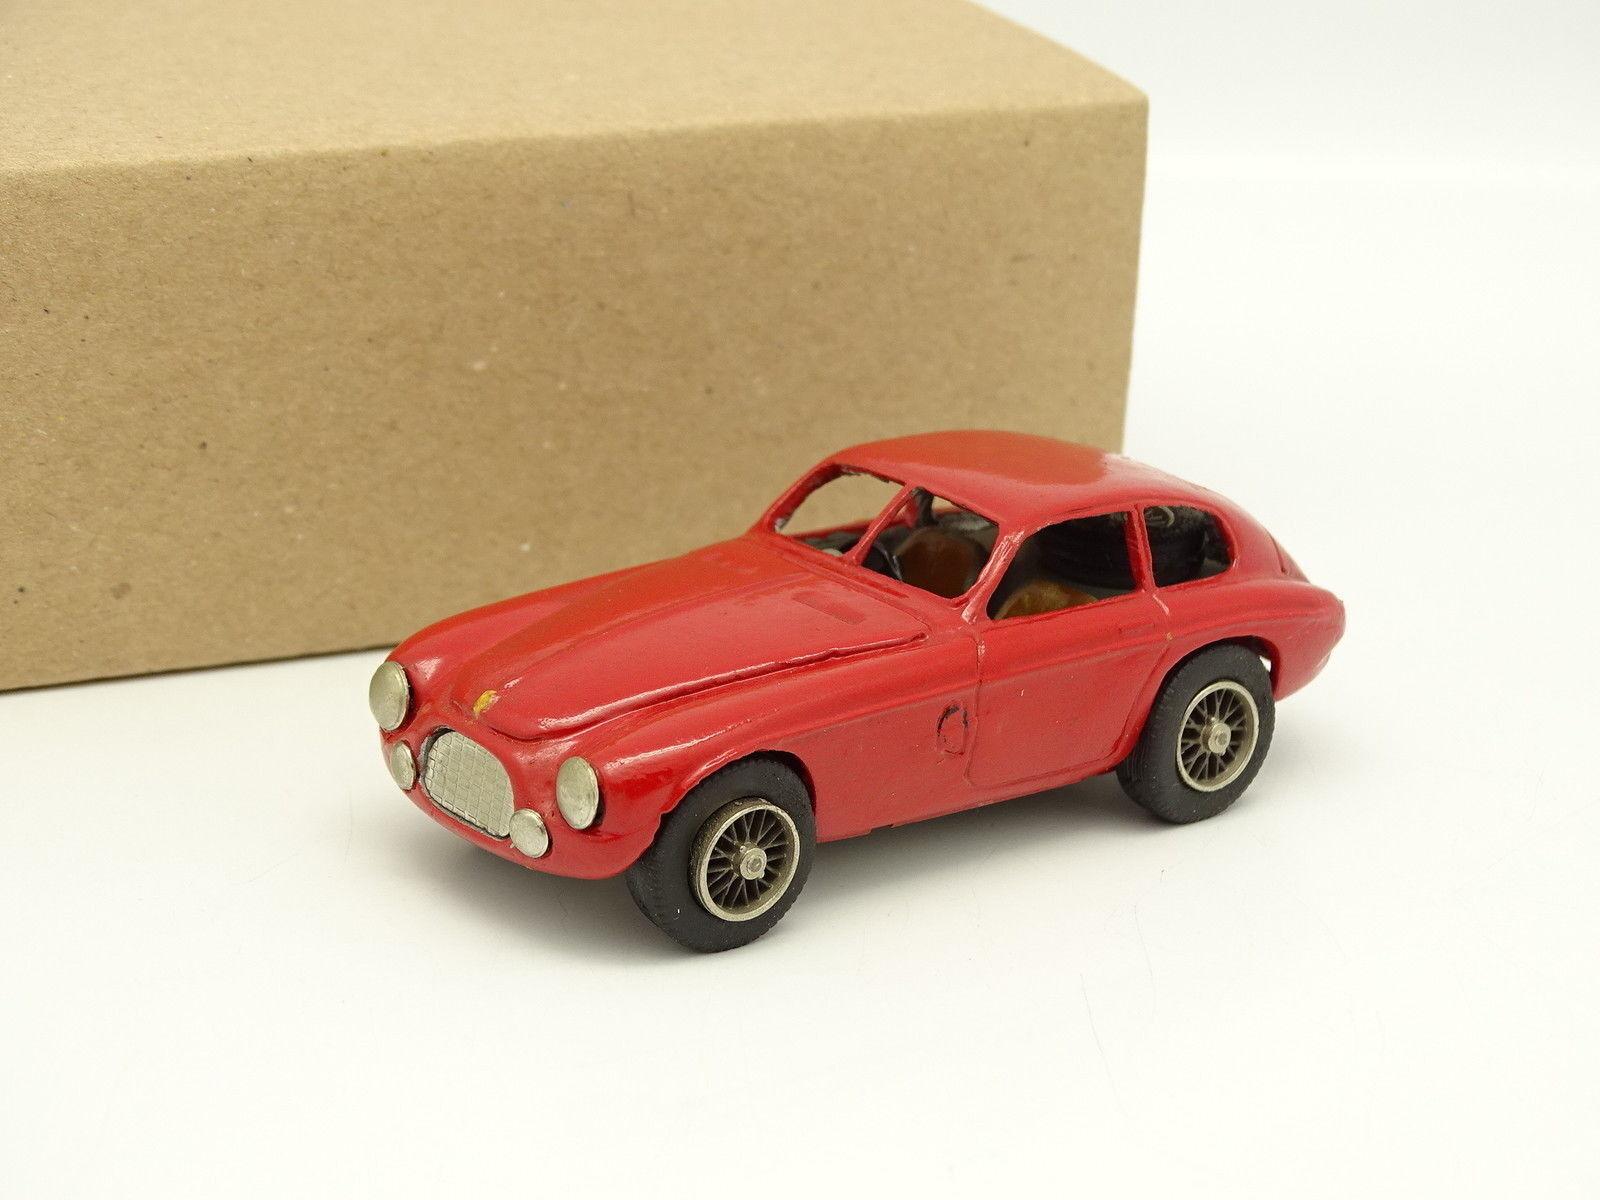 Set Metal Built 1 43 - Ferrari 166 mm Touring Red